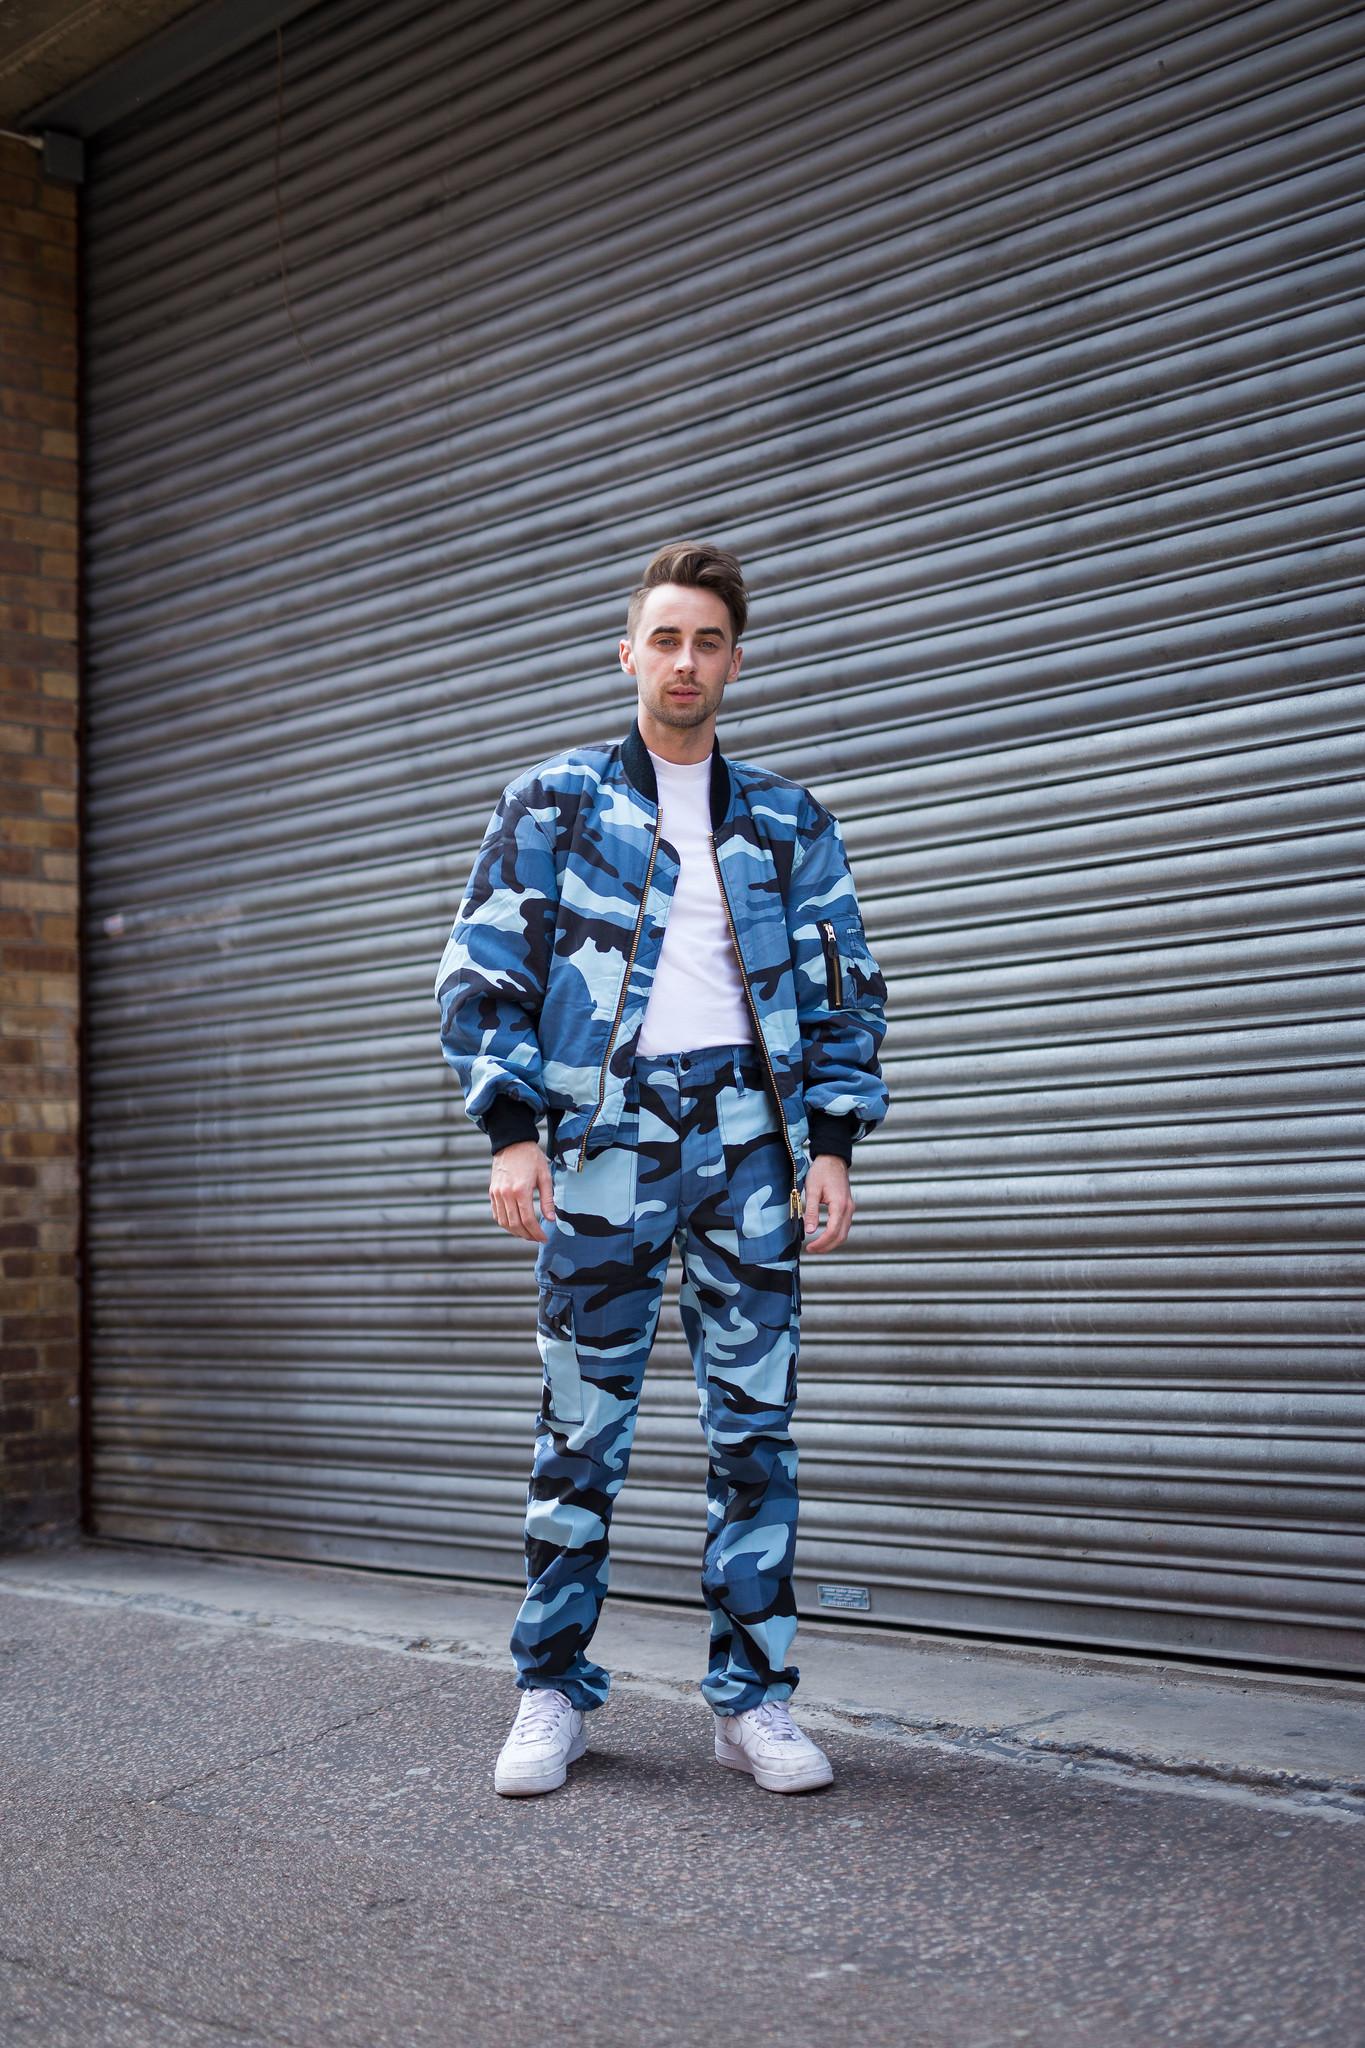 Street Style - Paul Treacy, Graduate Fashion Week